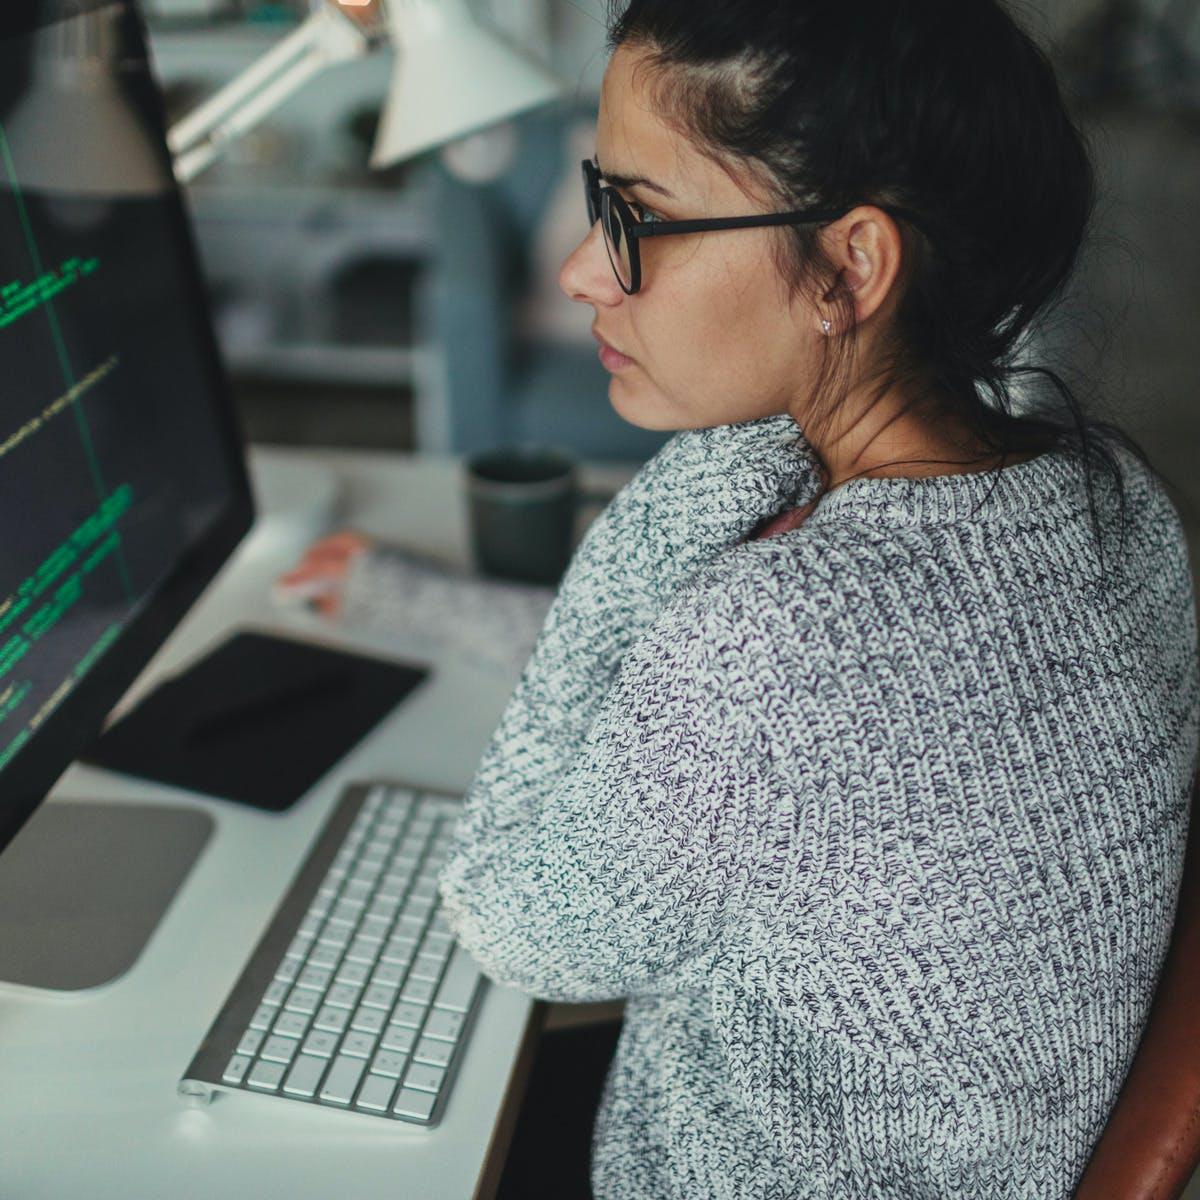 IT Security: Defense against the digital dark arts